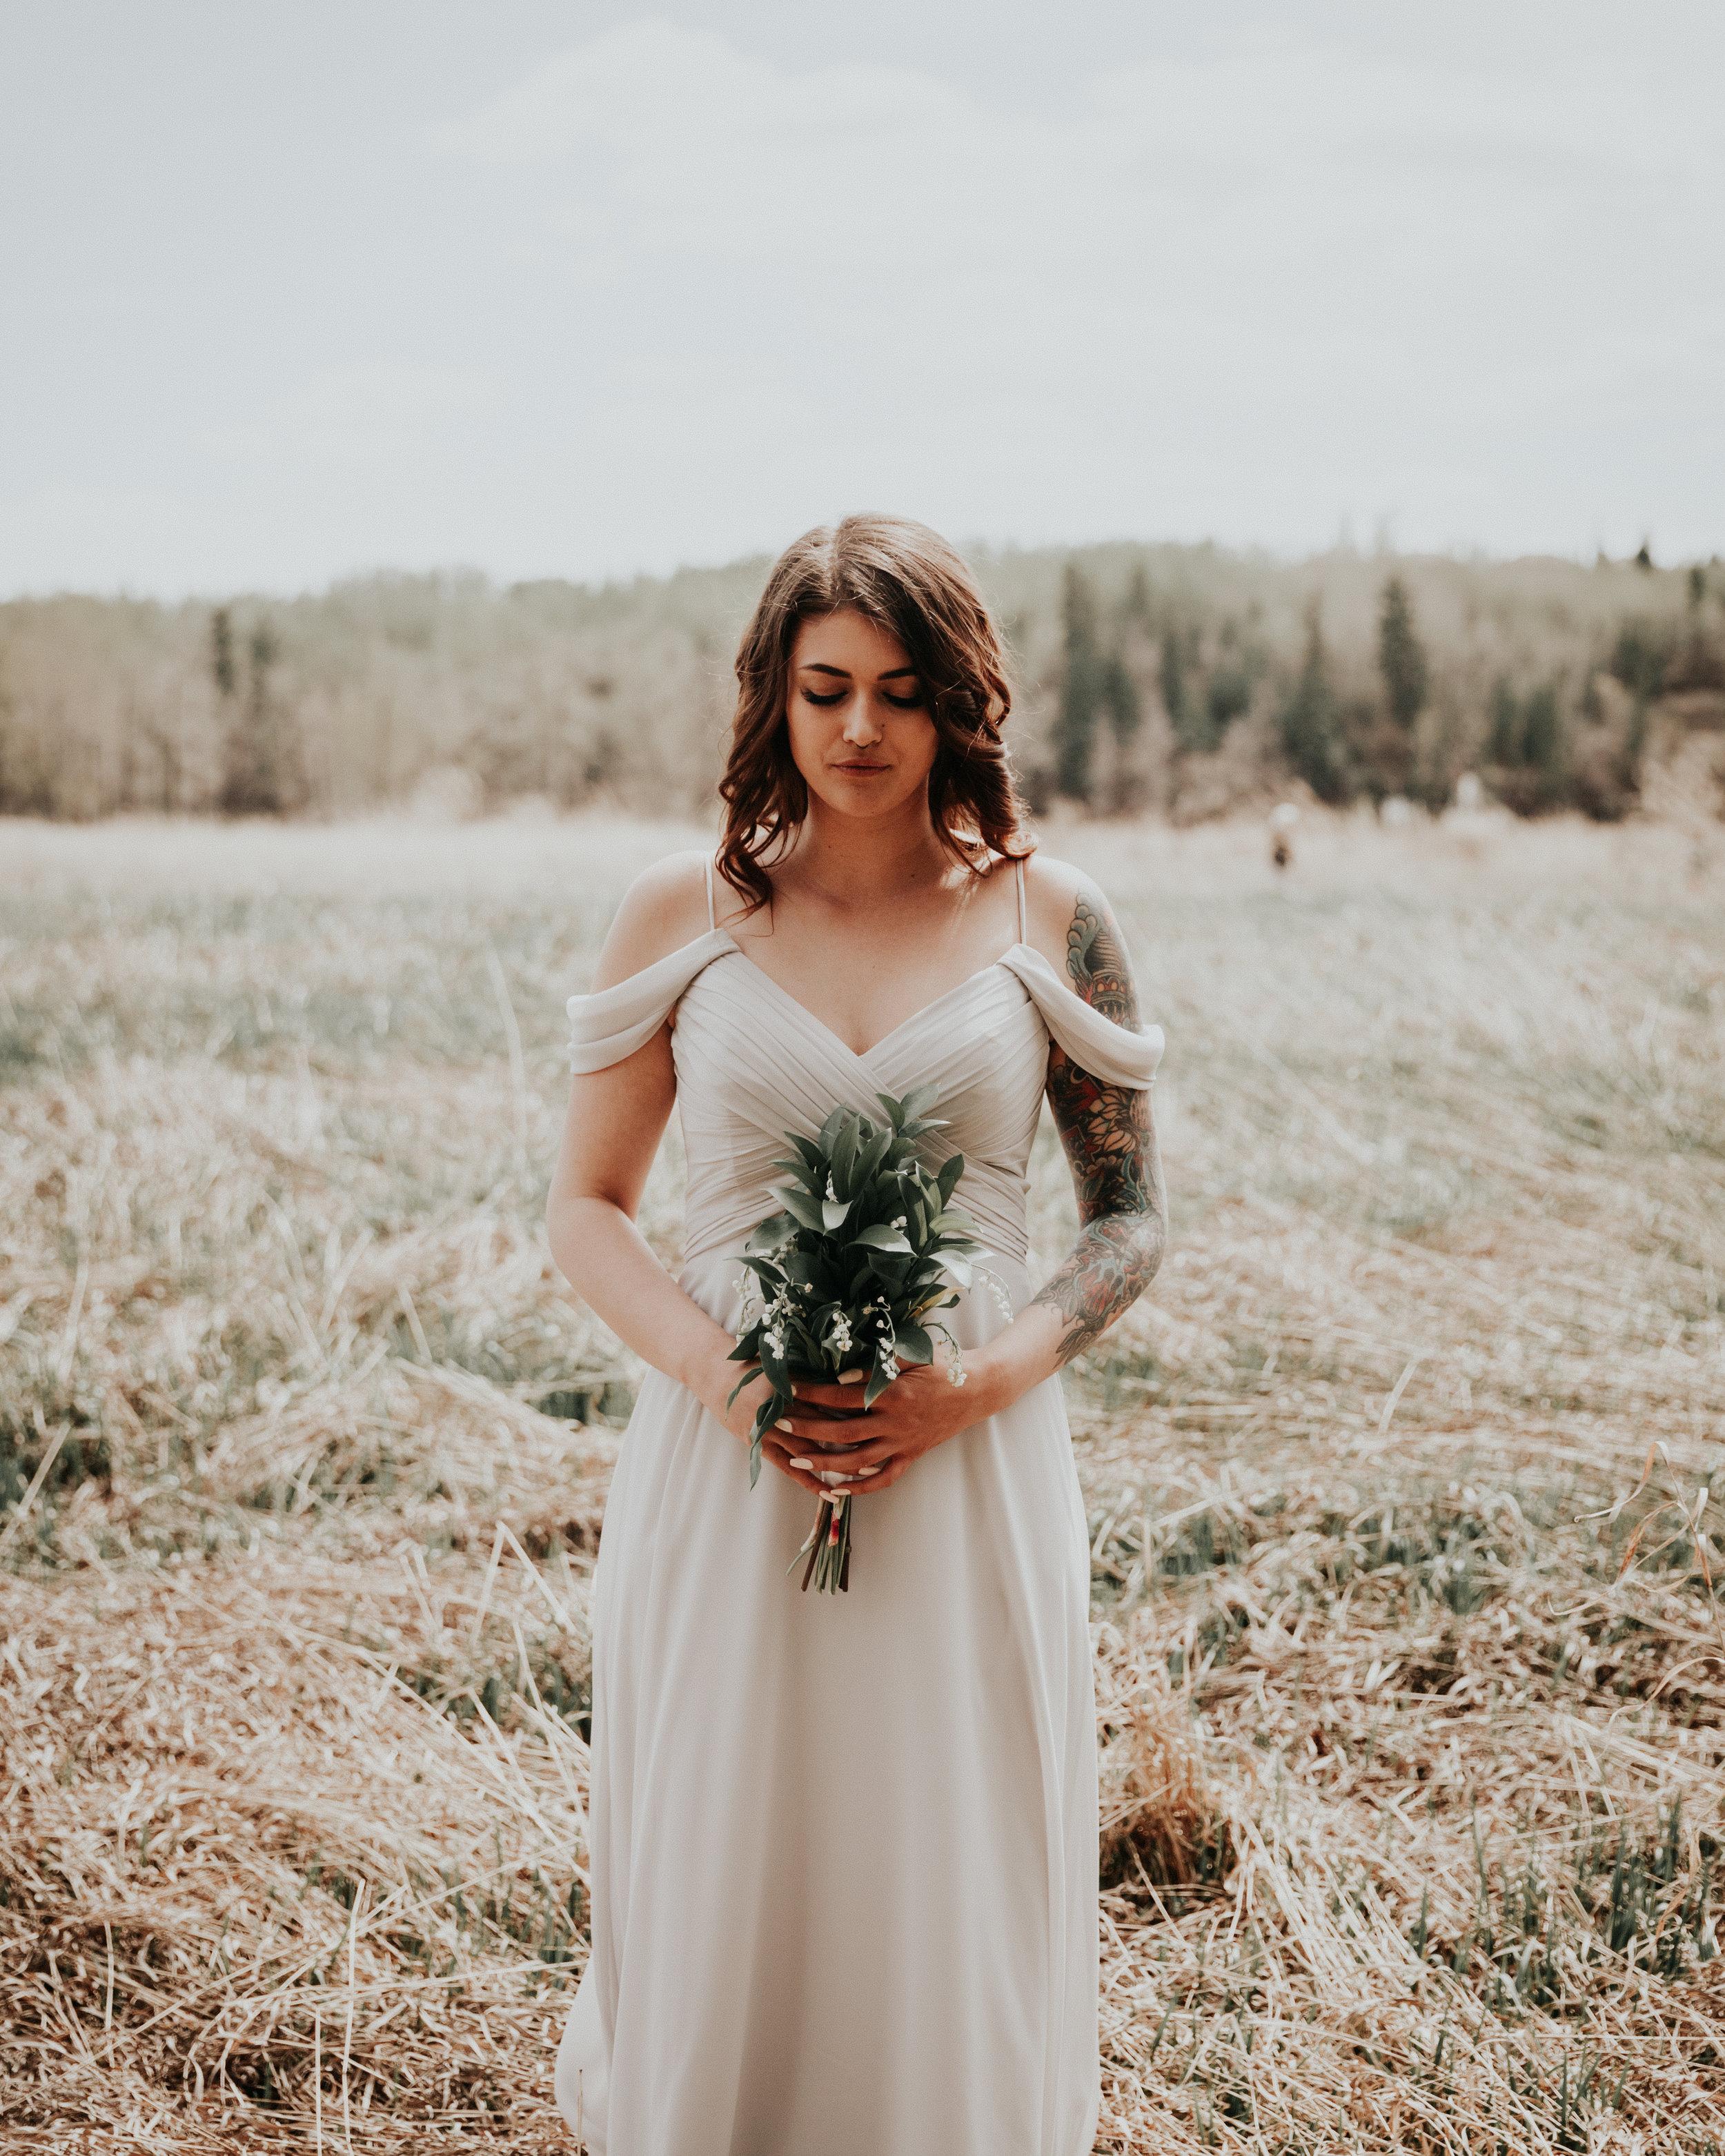 Walters Wedding Favourites - JayRMcDonald (11 of 18).JPG